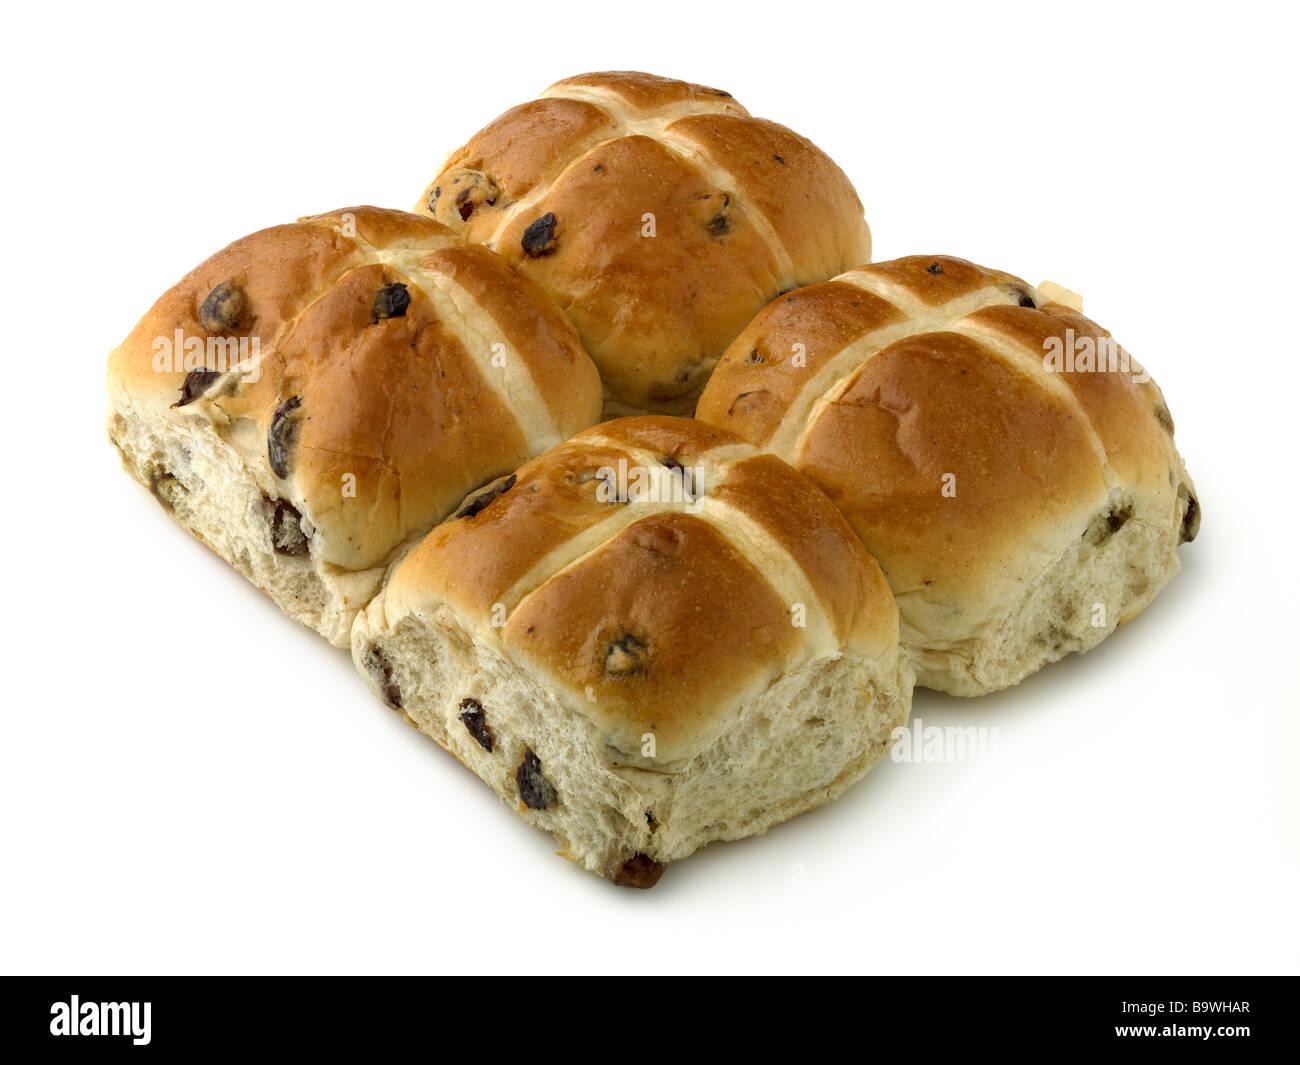 hot cross buns - Stock Image